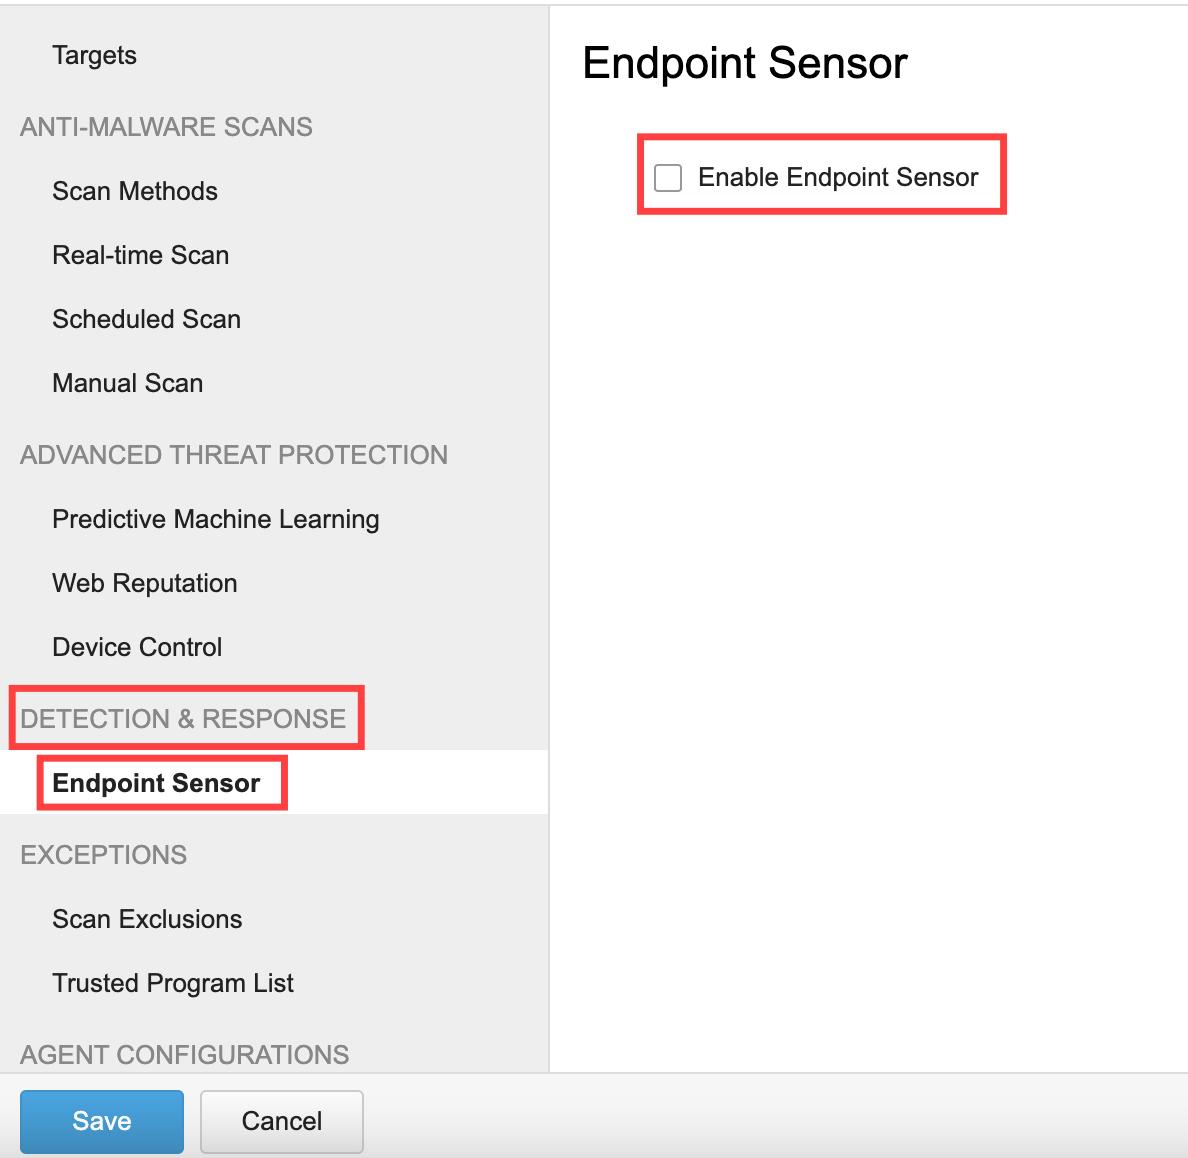 untick Enable Endpoint Sensor